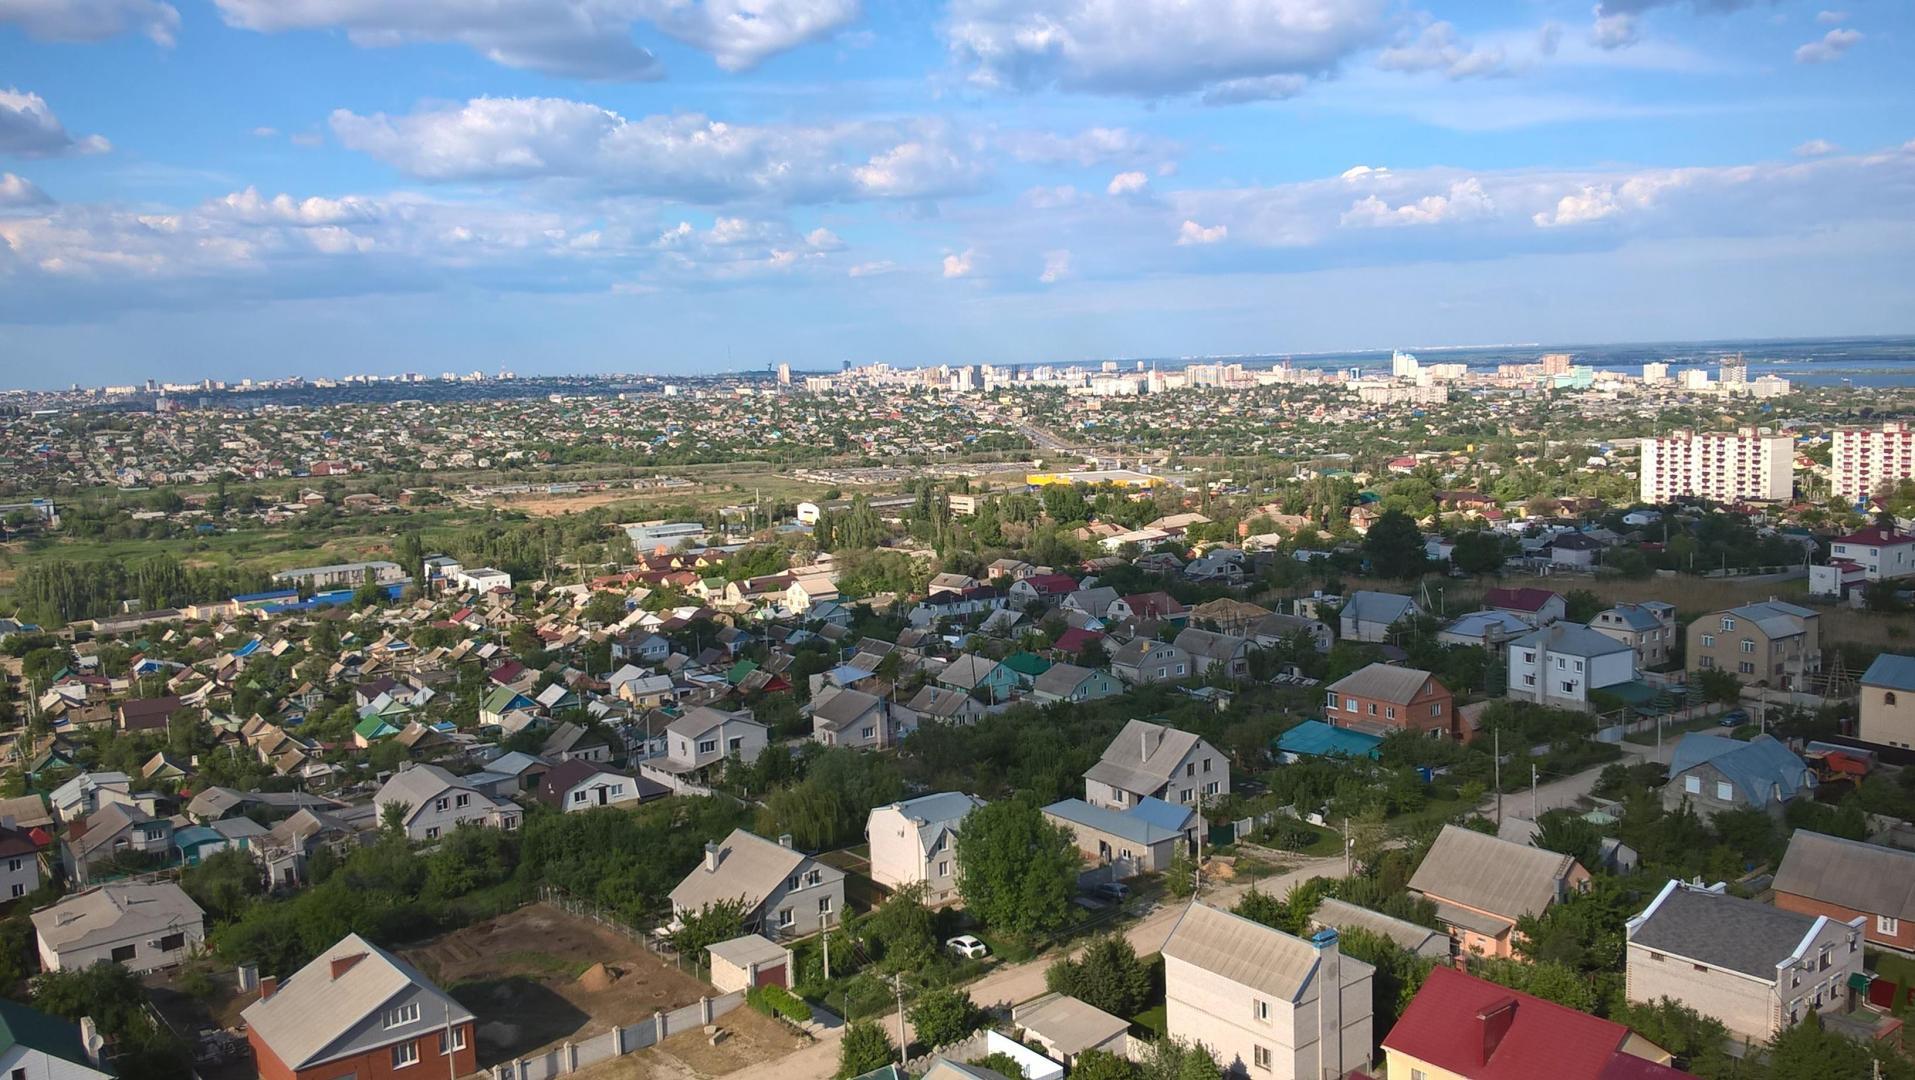 Продаётся 2-комн.               квартира, 5.6 сот,  Волгоград,               Советский, улица Тимирязева, 15